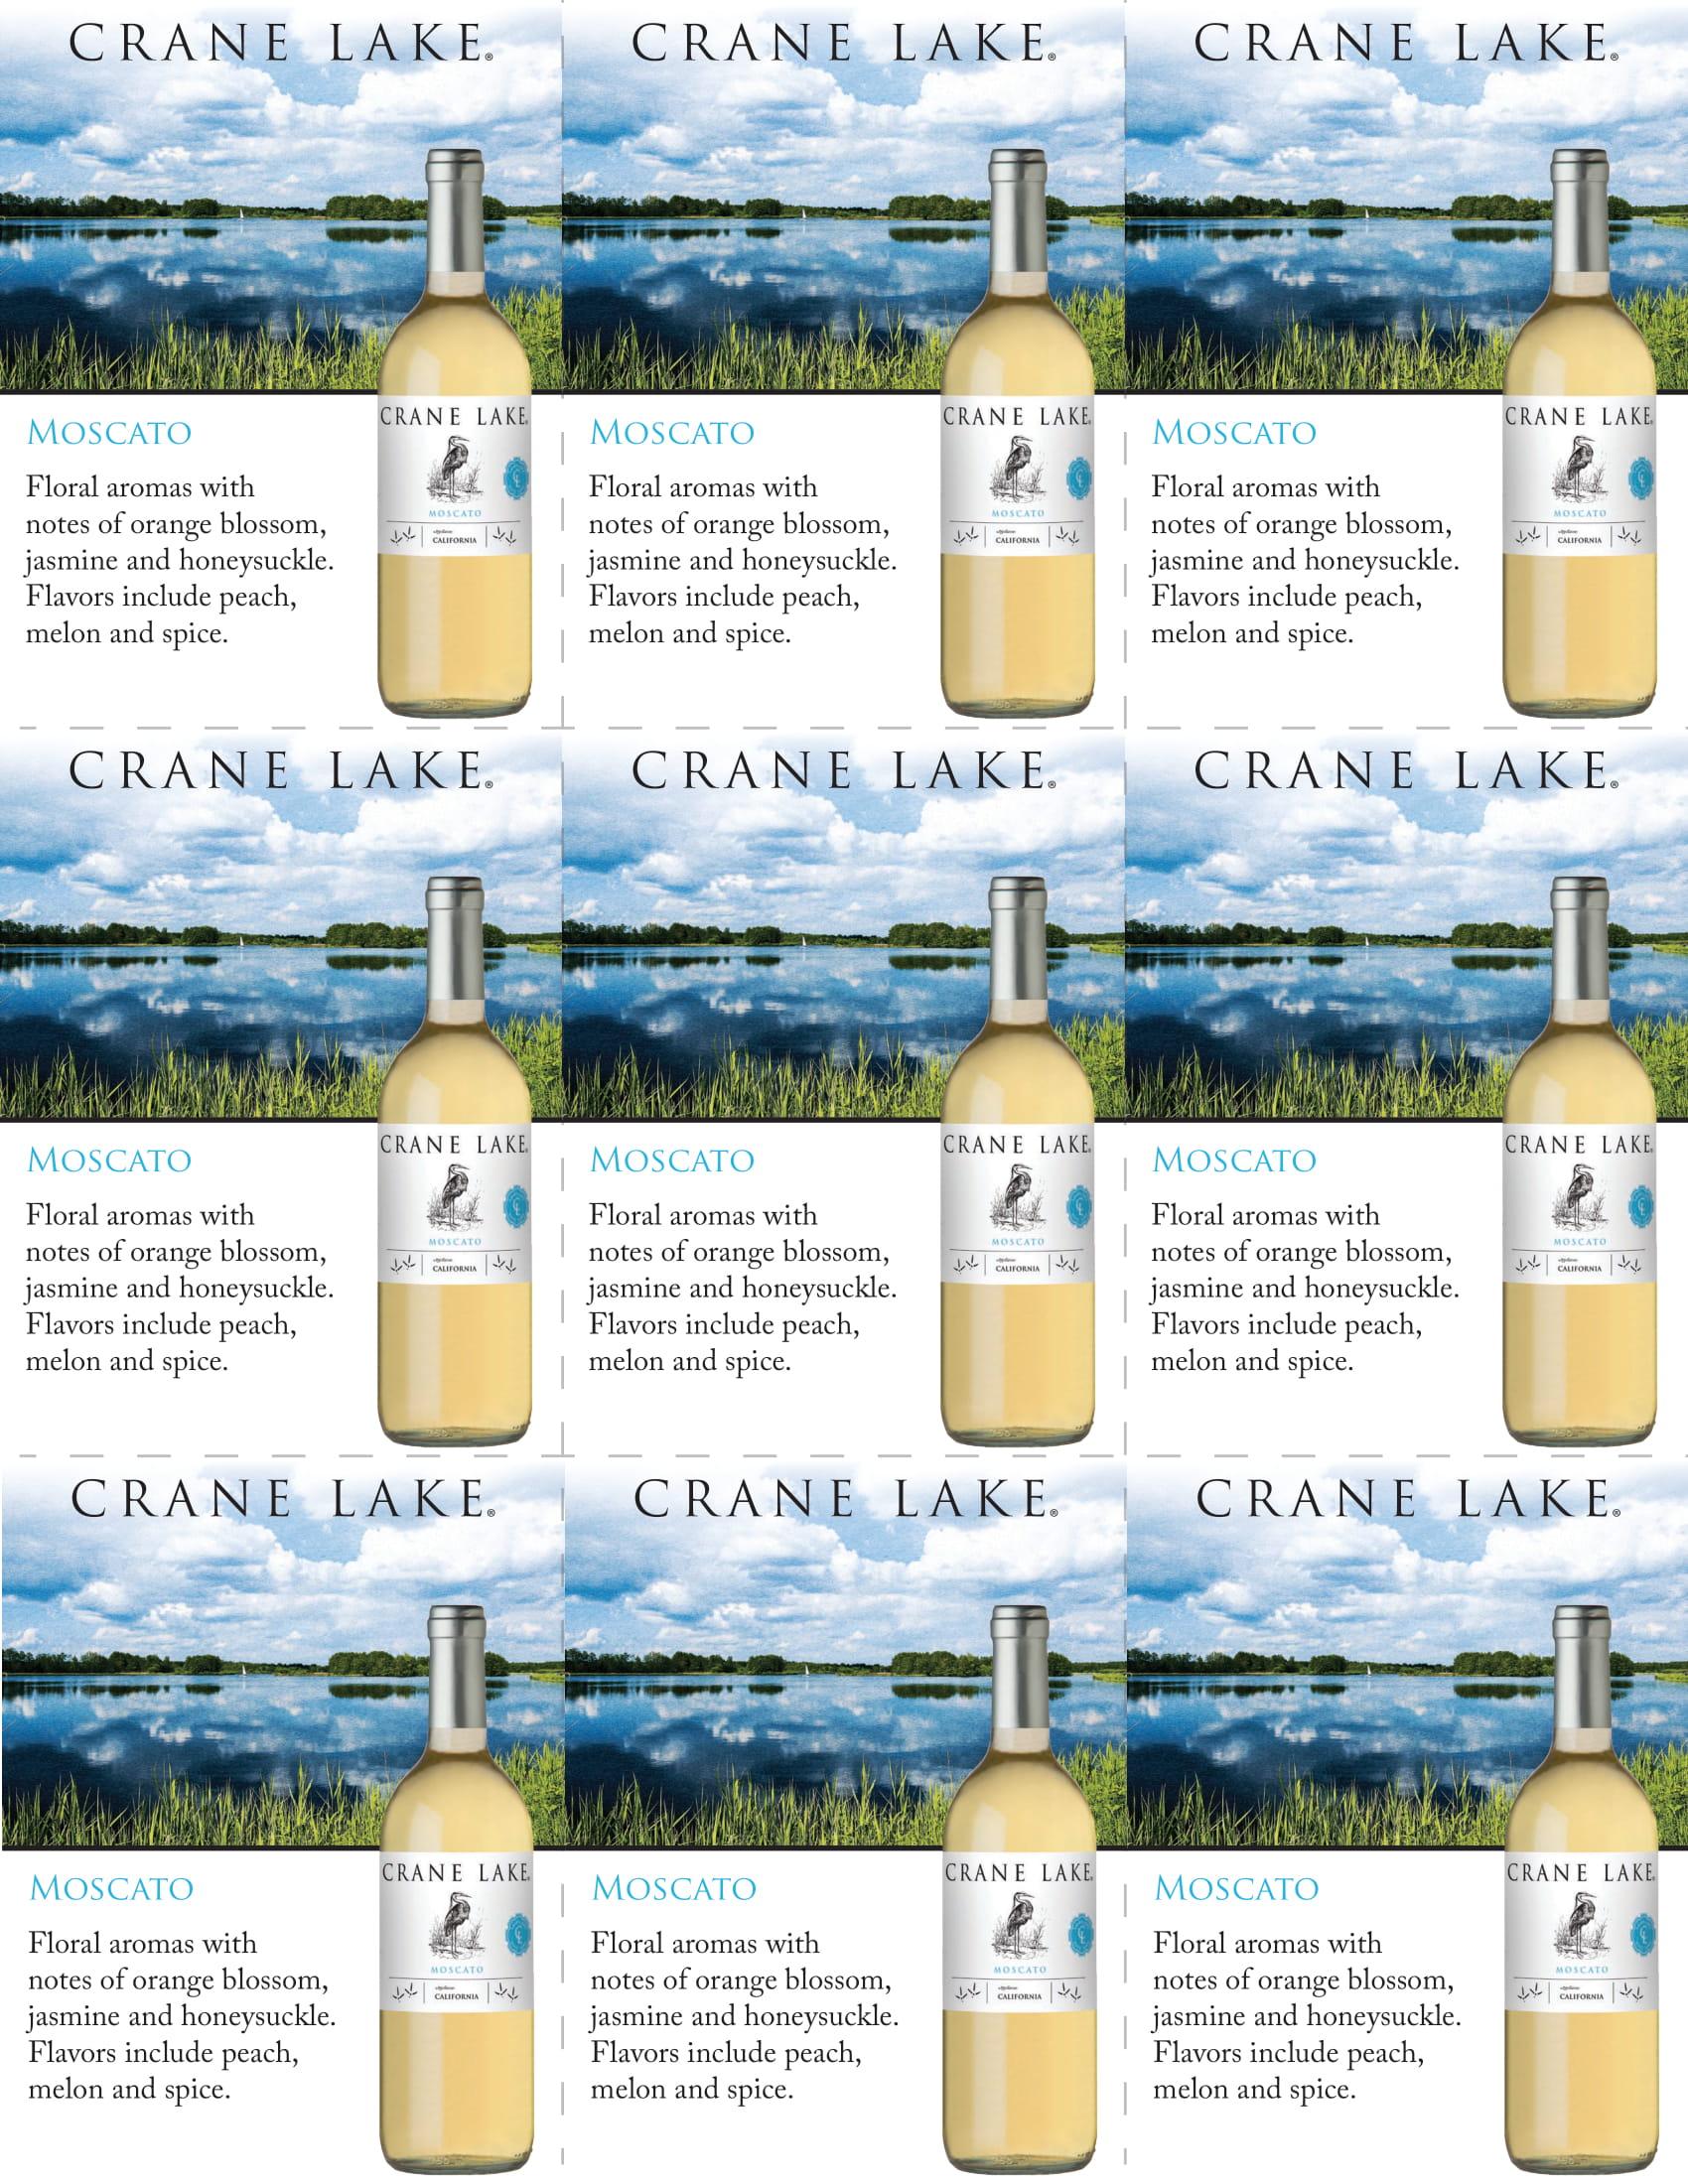 Crane Lake Moscato Shelf Talkers